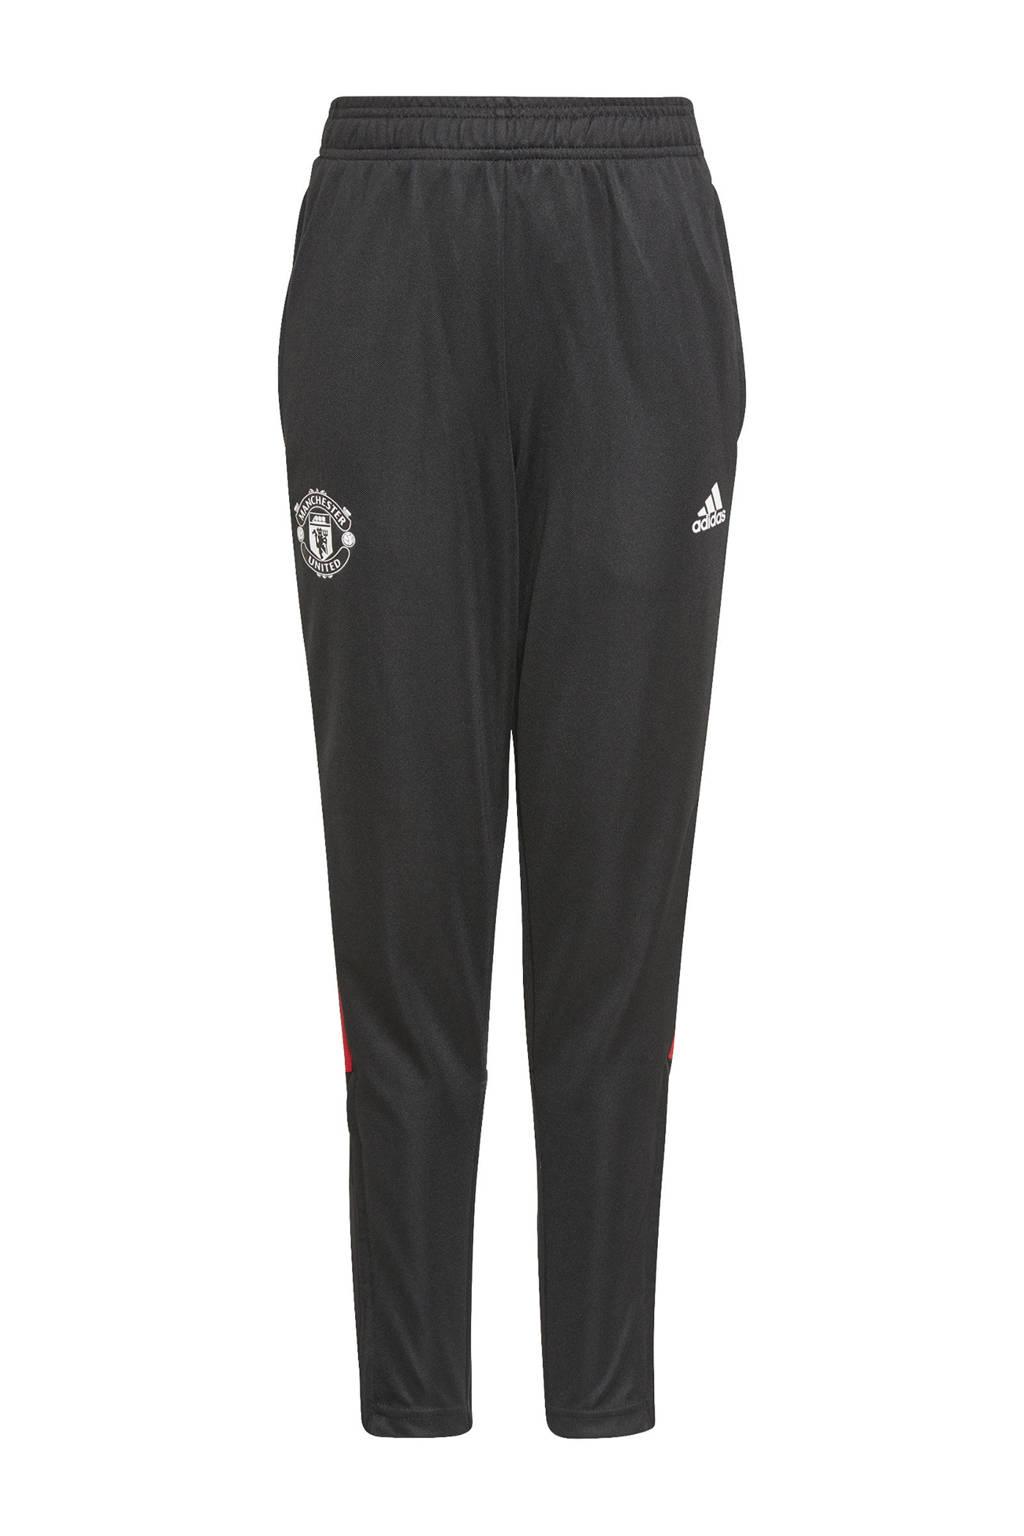 adidas Performance Junior Manchester United voetbalbroek training, Zwart